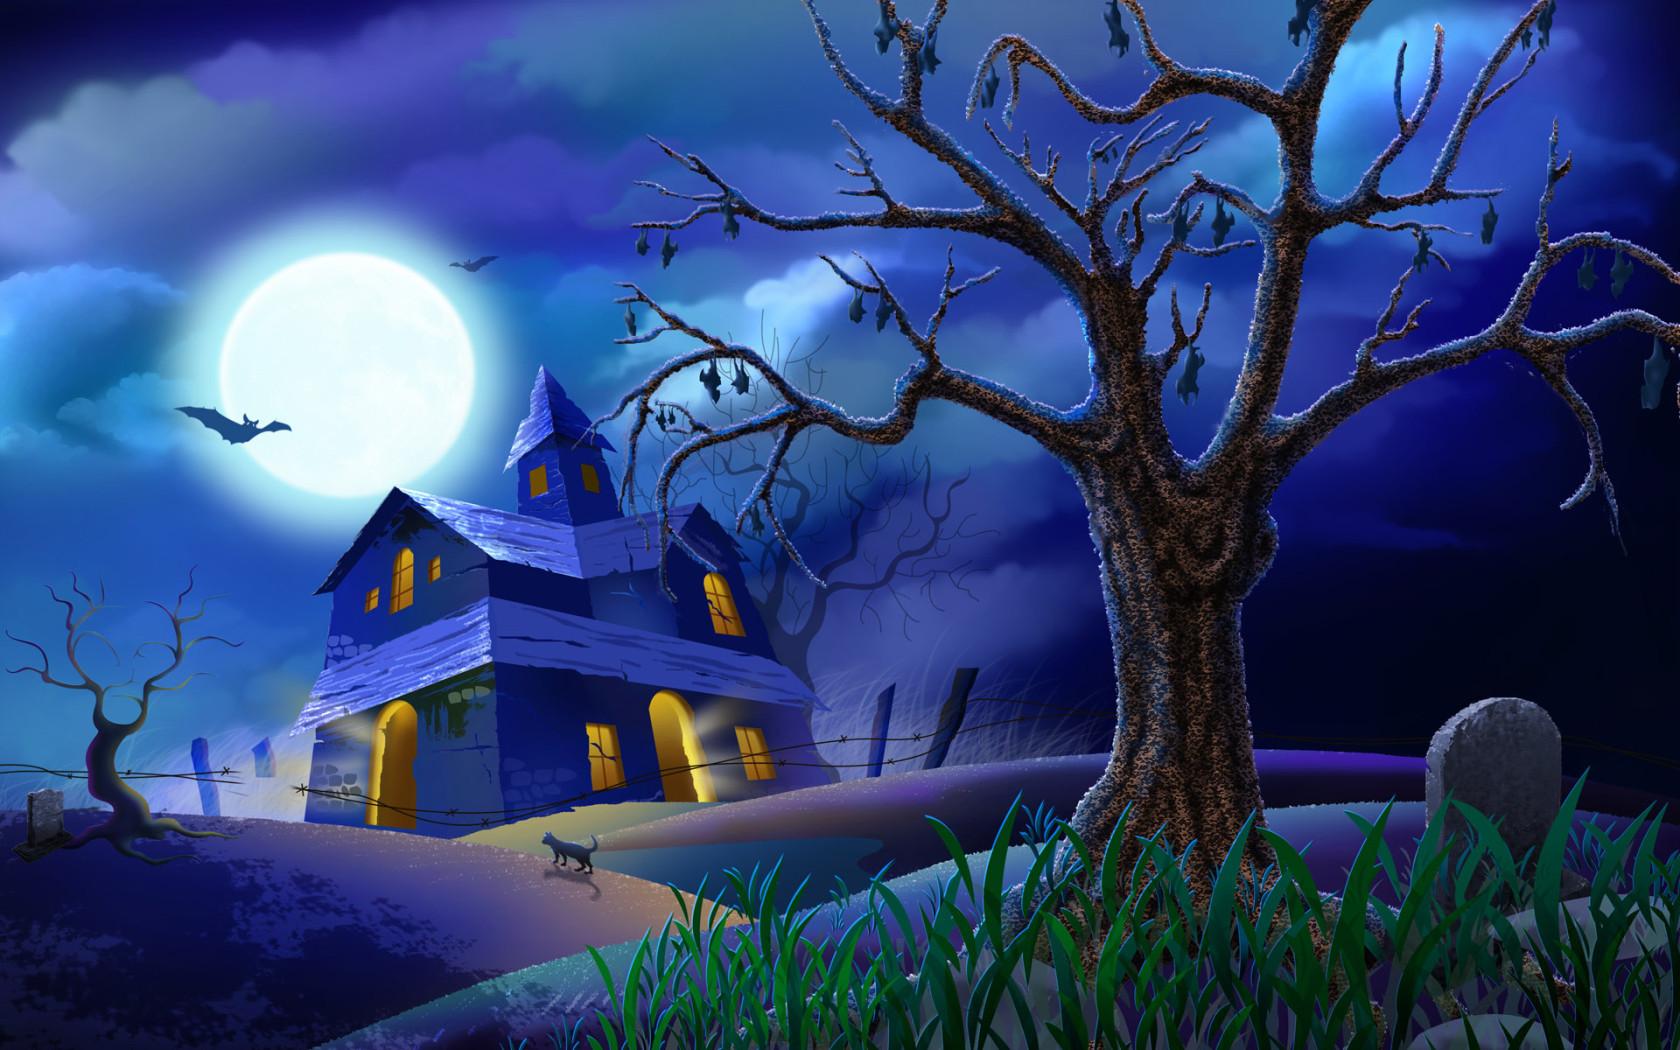 Halloween Wallpaper Downloads